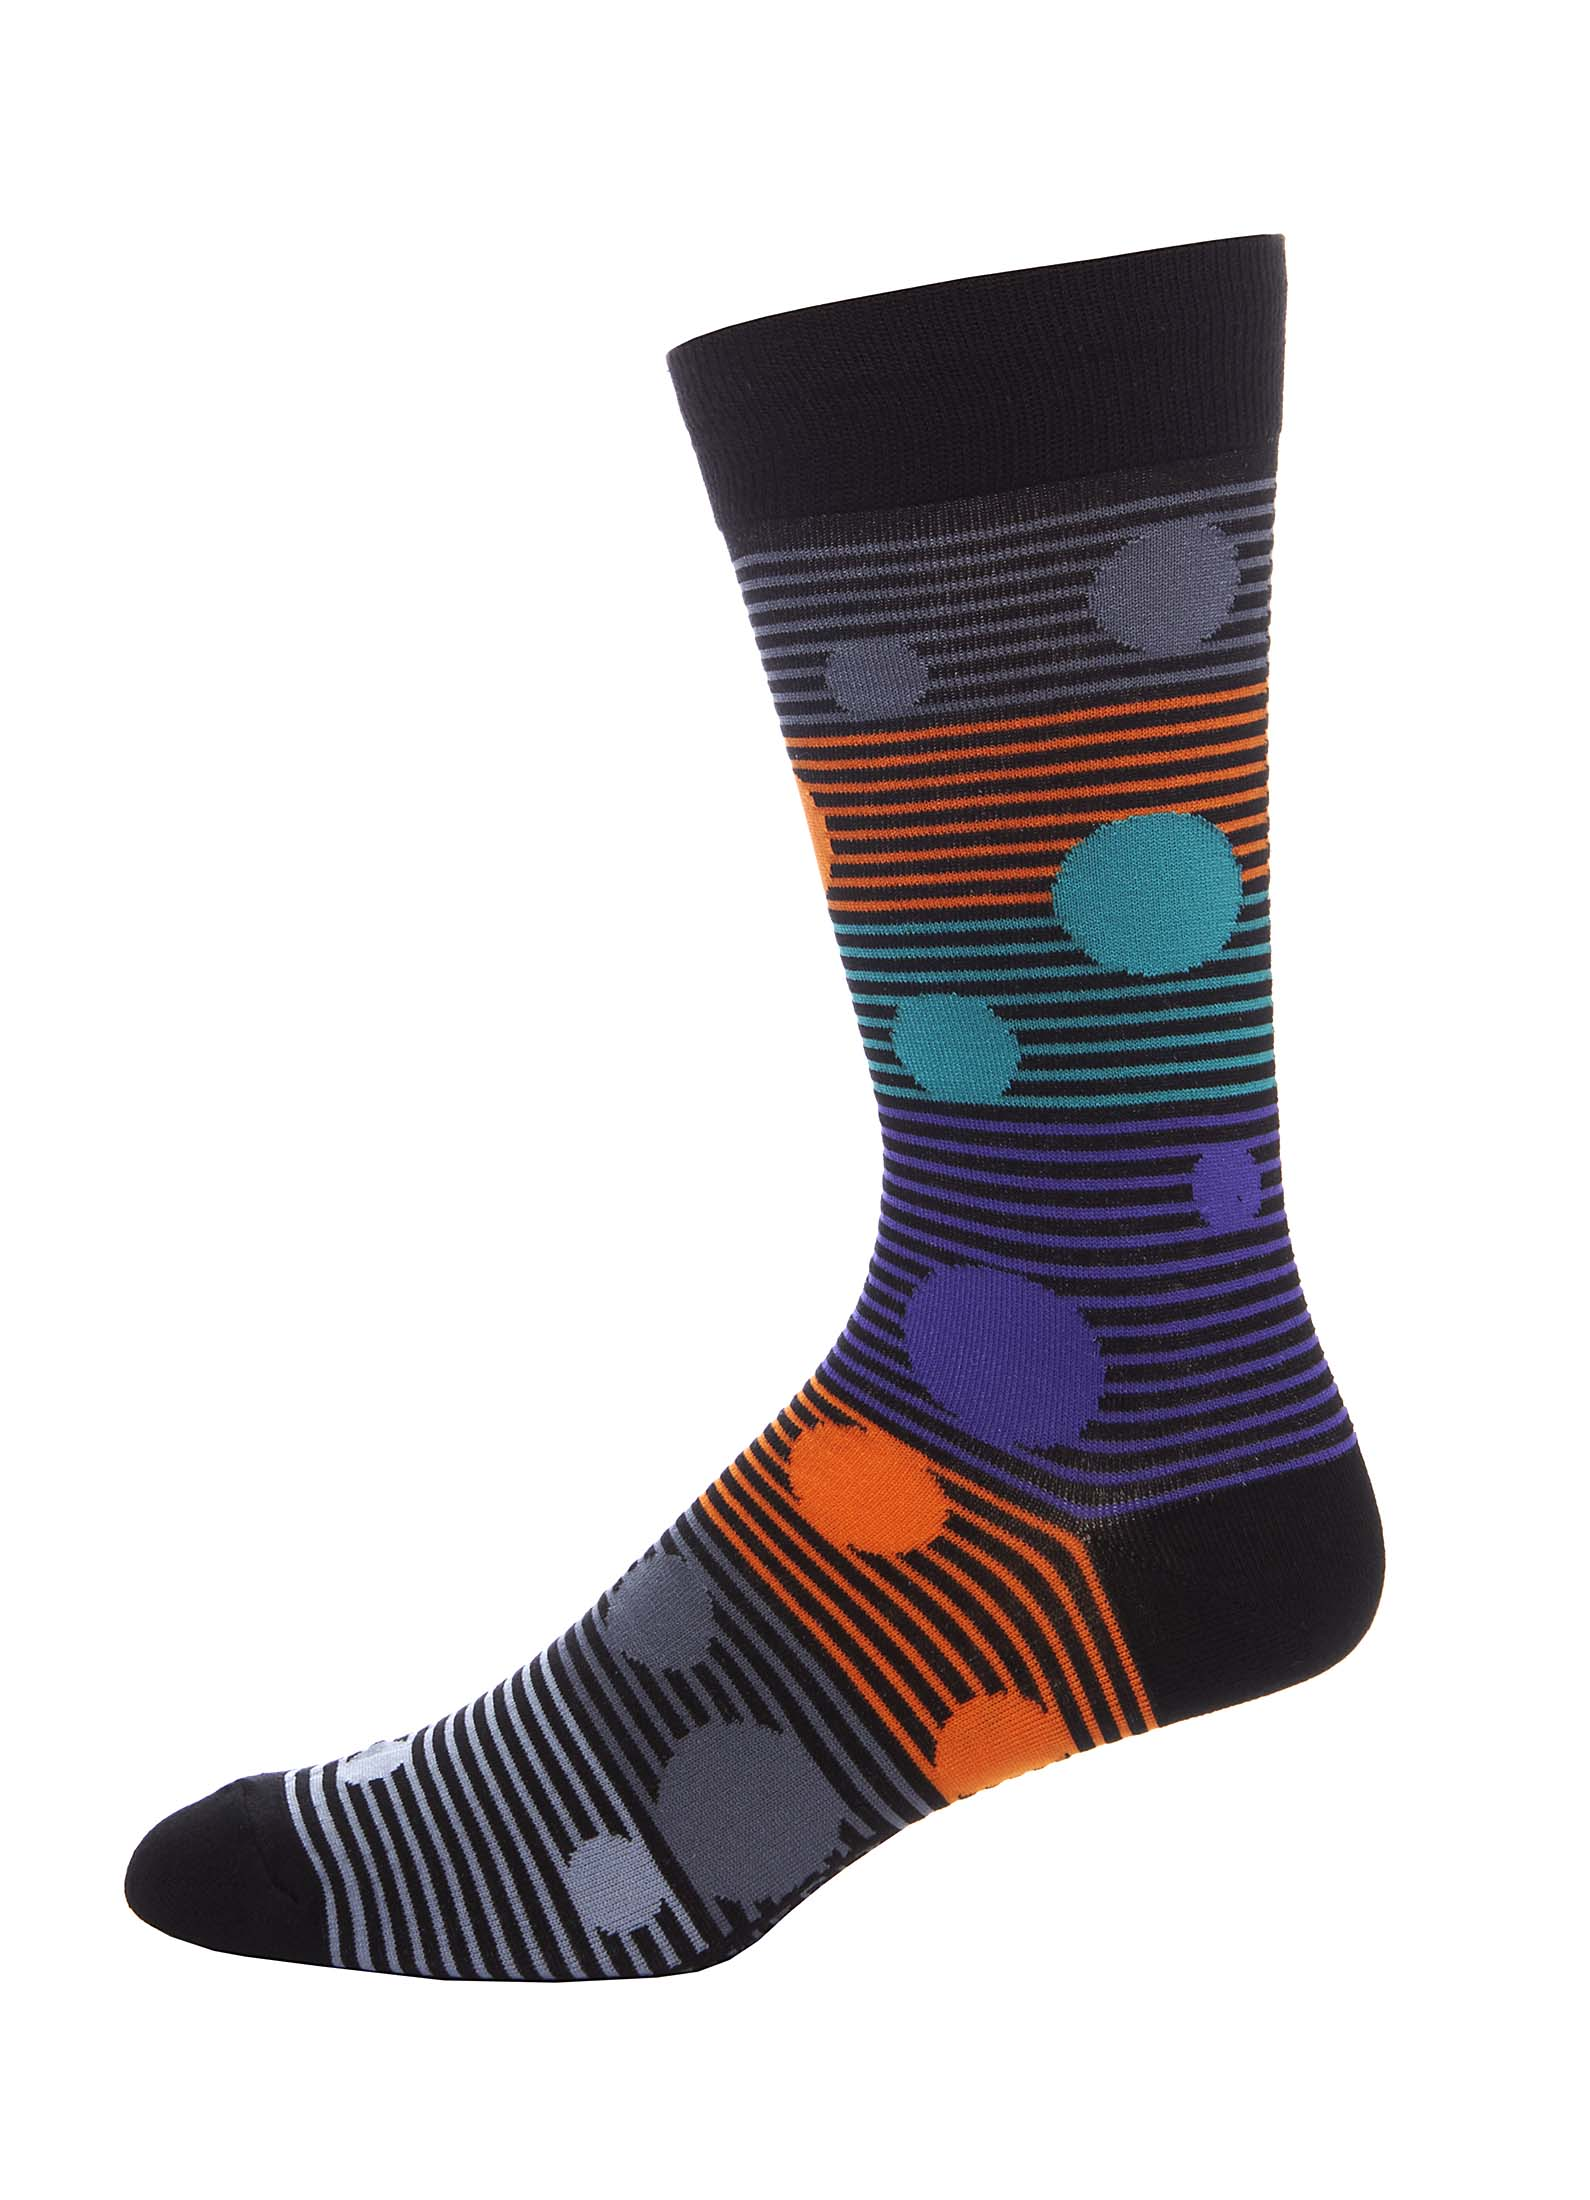 Fresh Fit Novelty Menu0026#39;s Trouser Socks Set Of 3